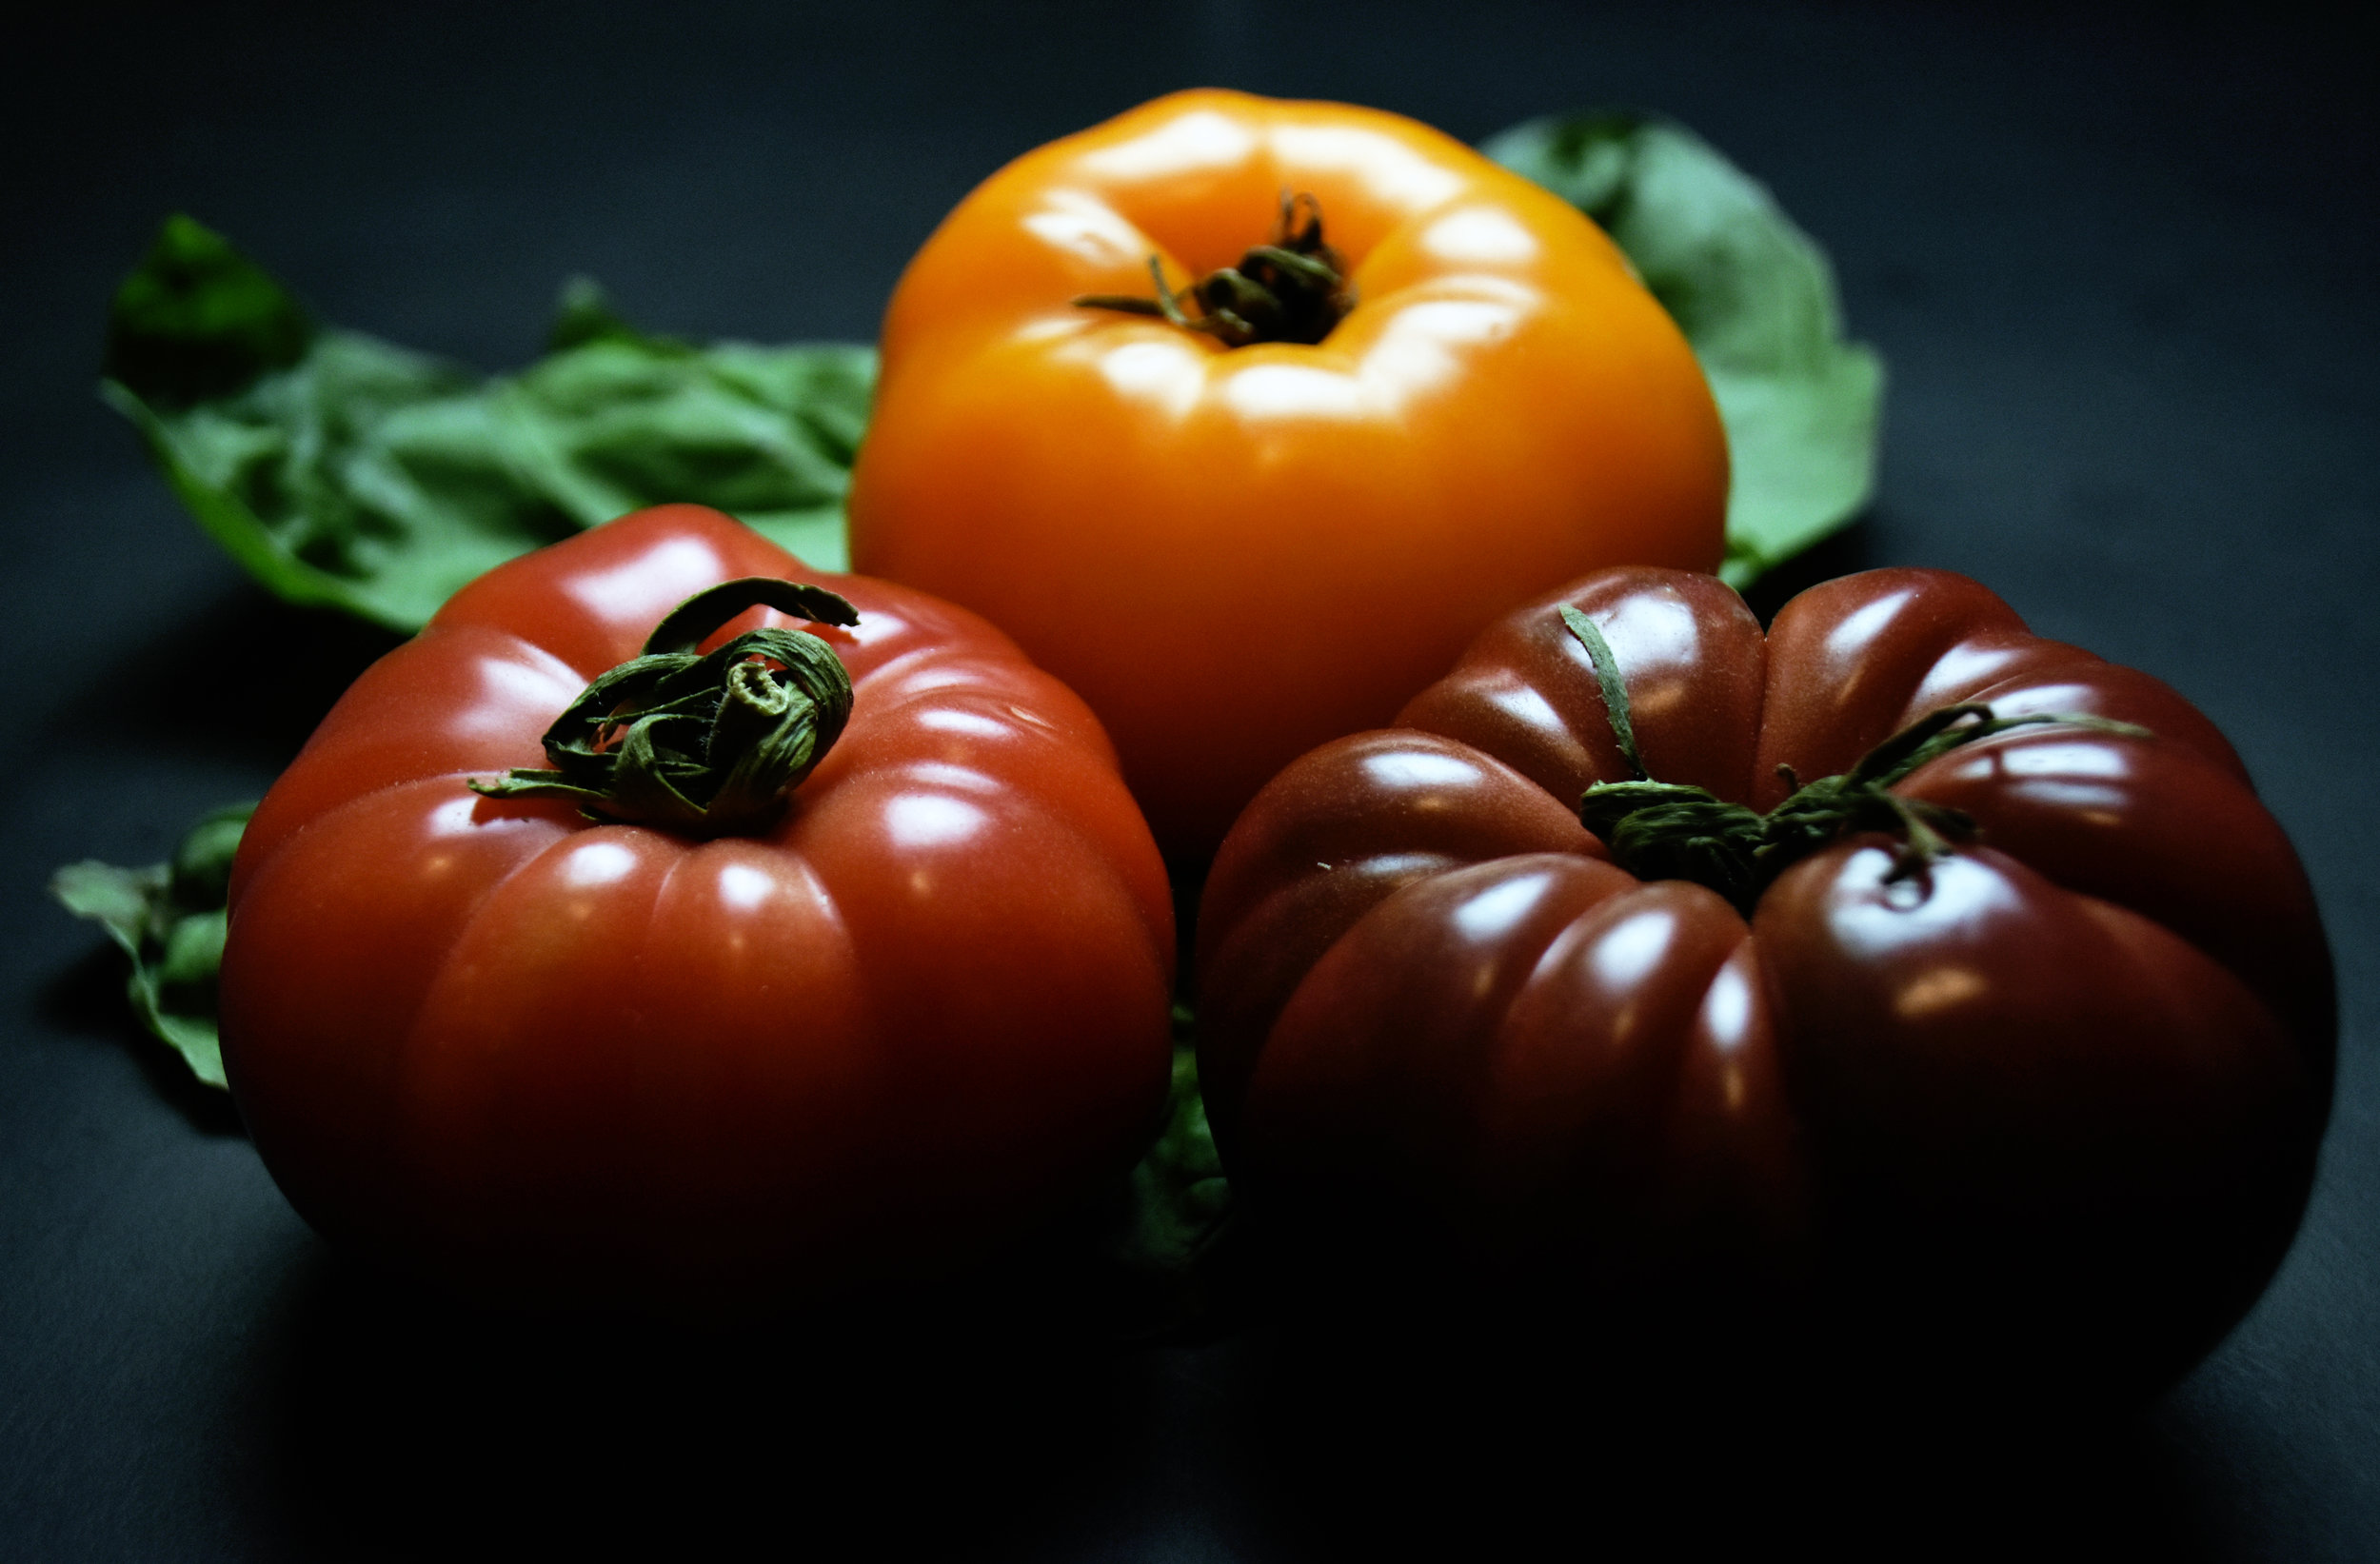 heirloom tomatoes - summer's best emblem